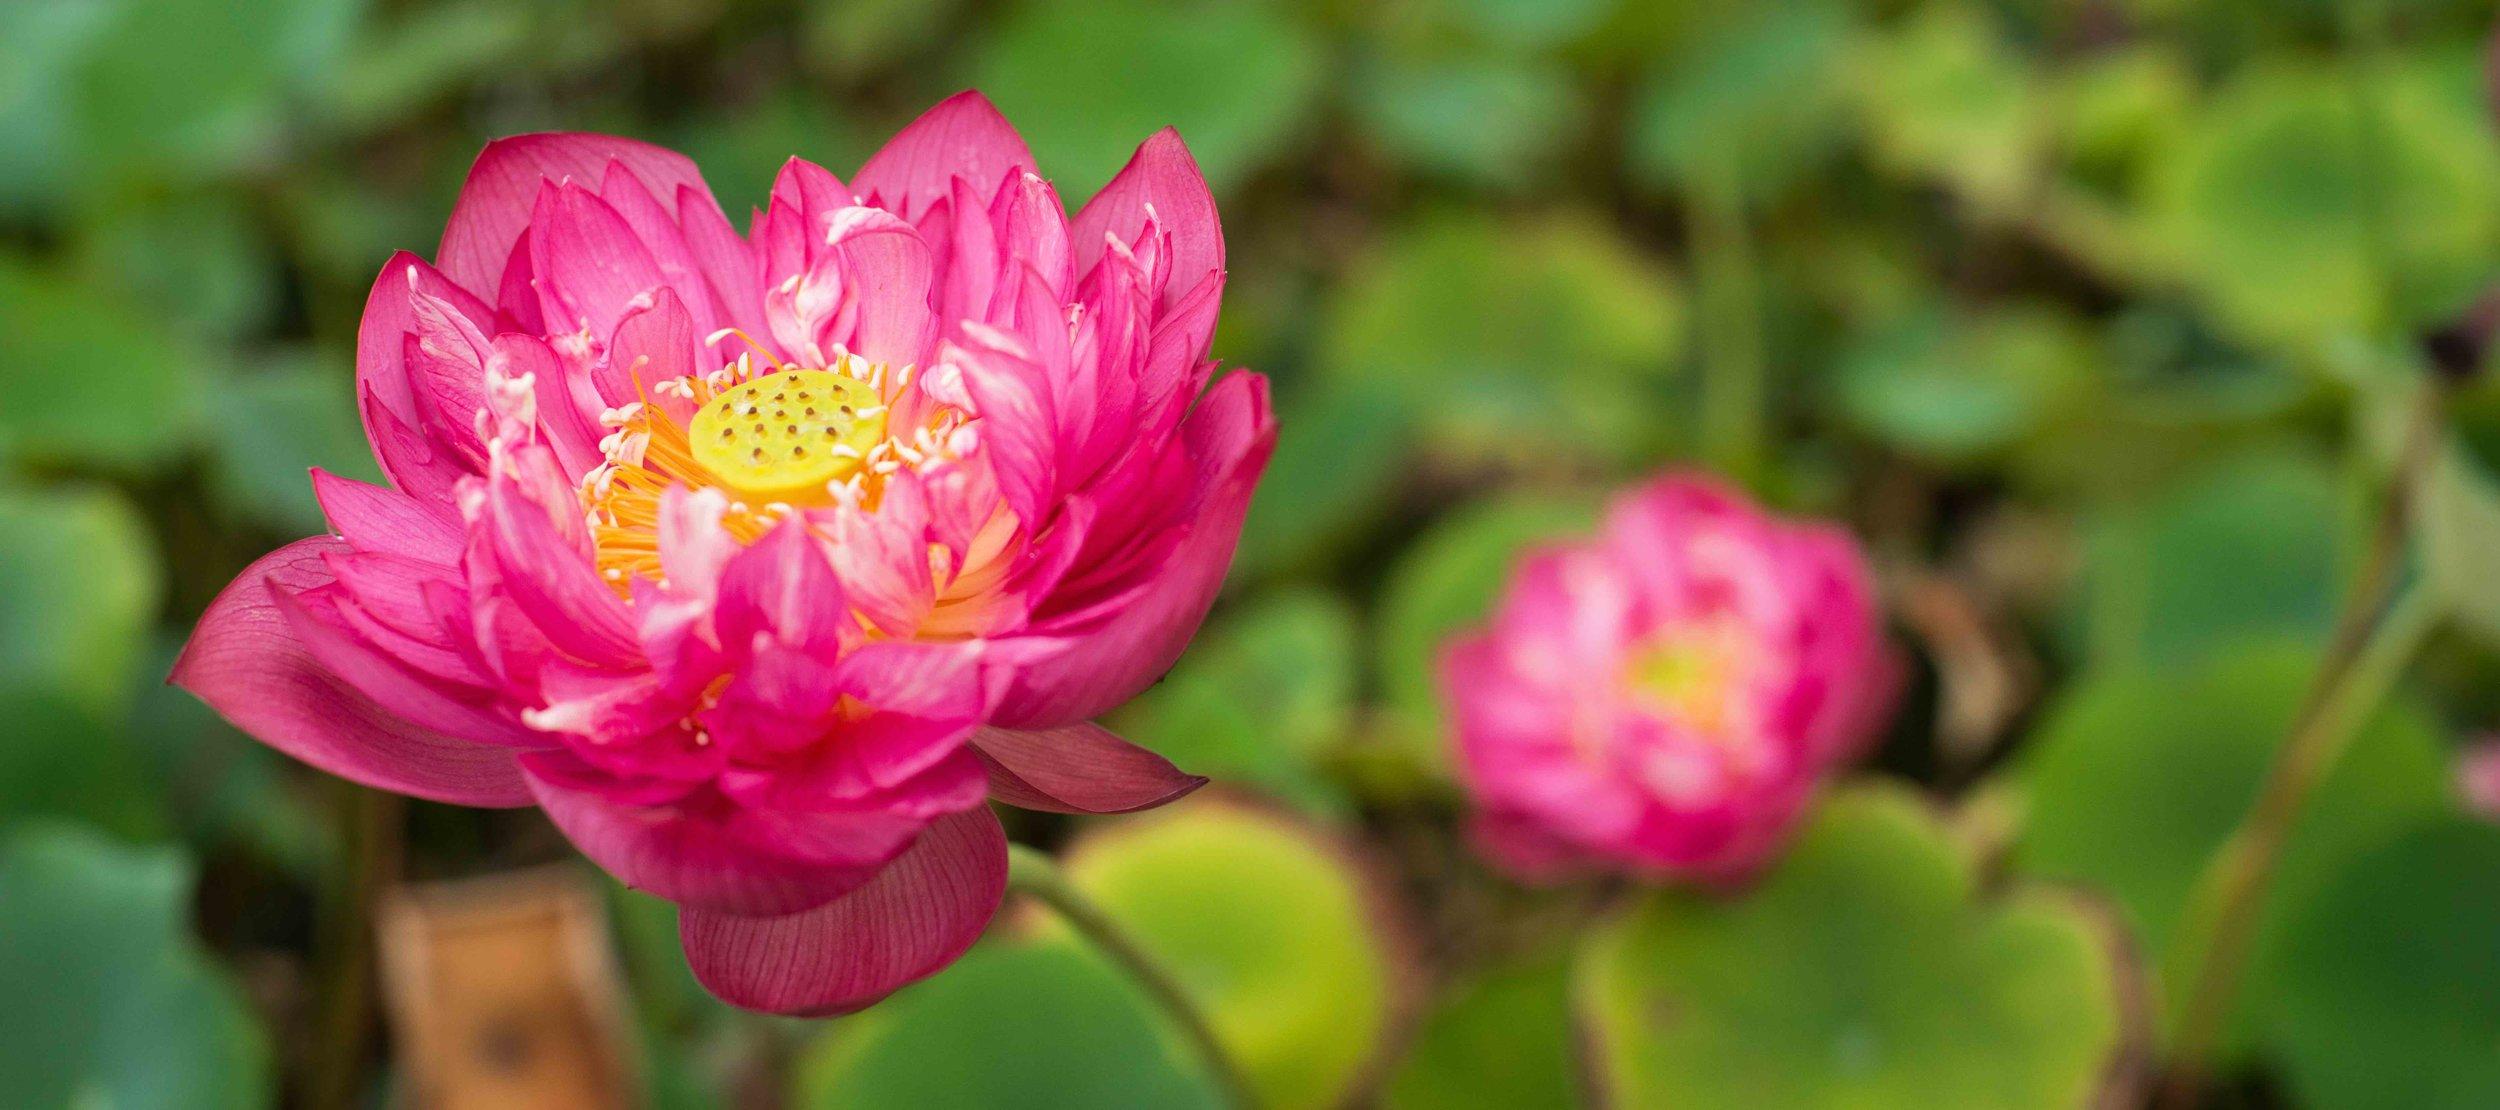 lotus flower LR.jpg